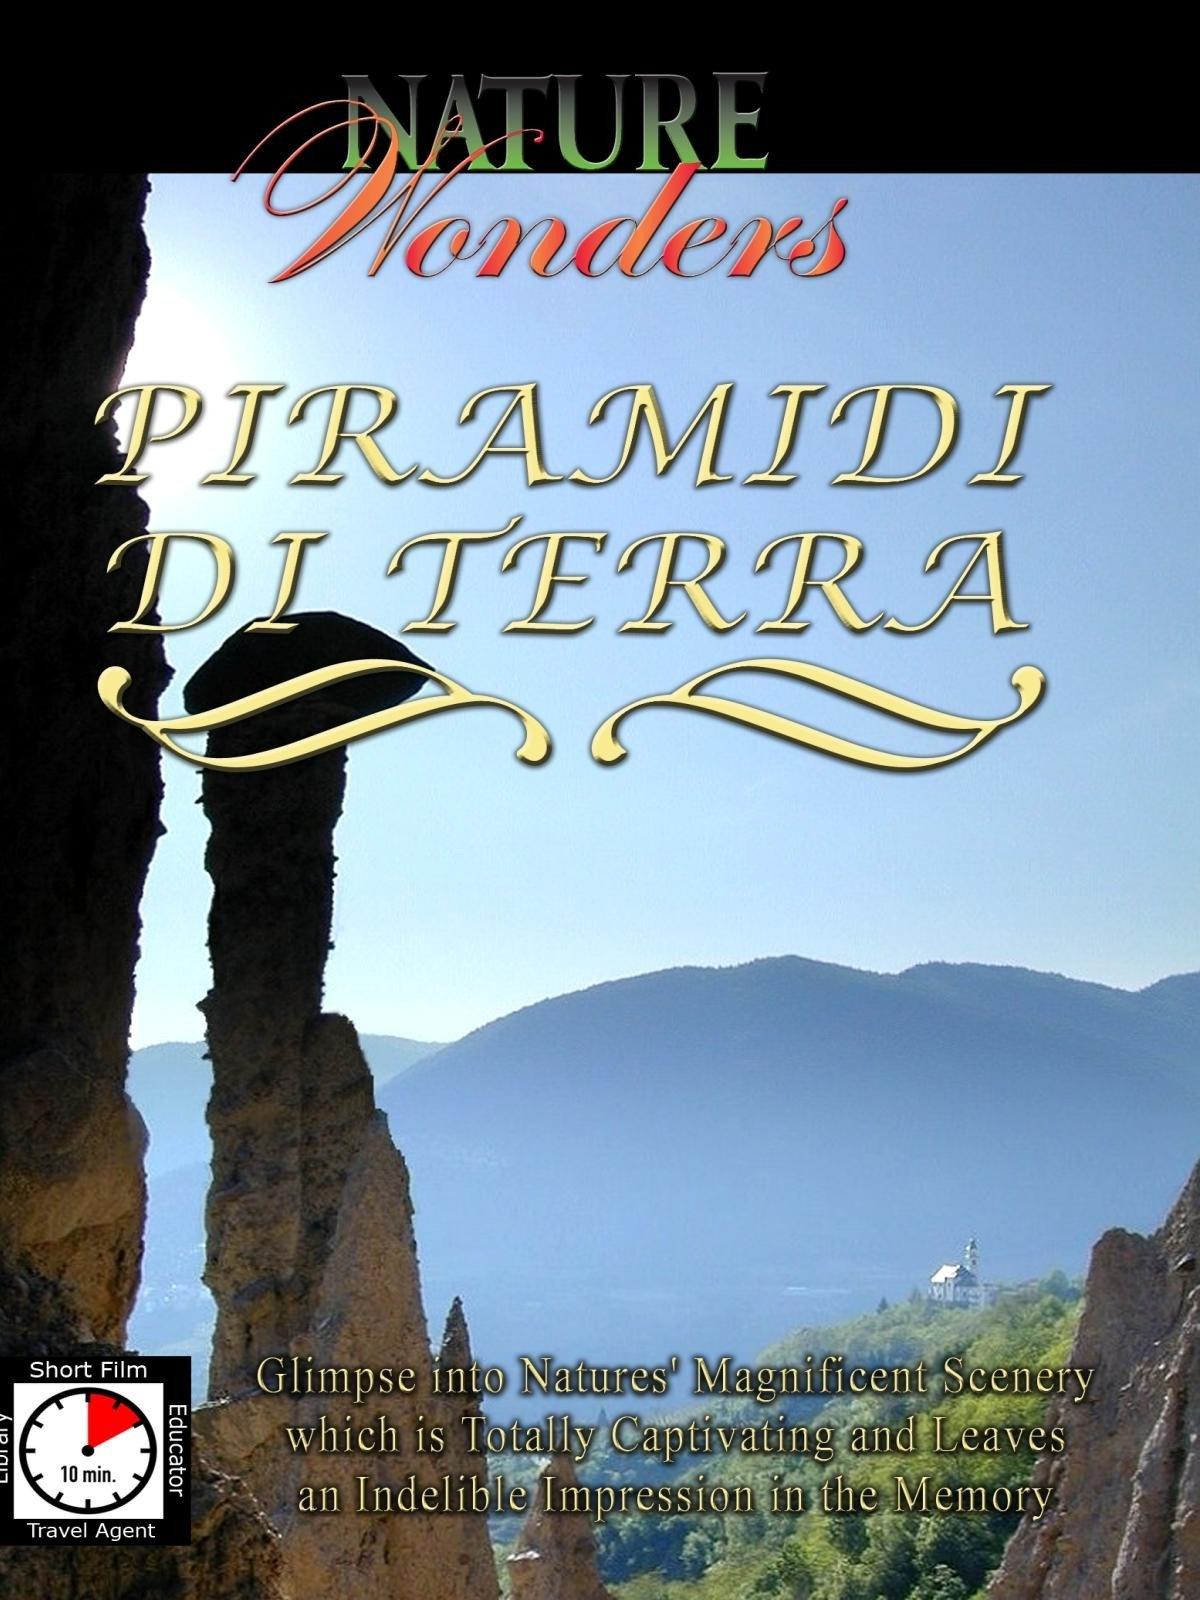 Nature Wonders - Piramidi Di Terra, Italy